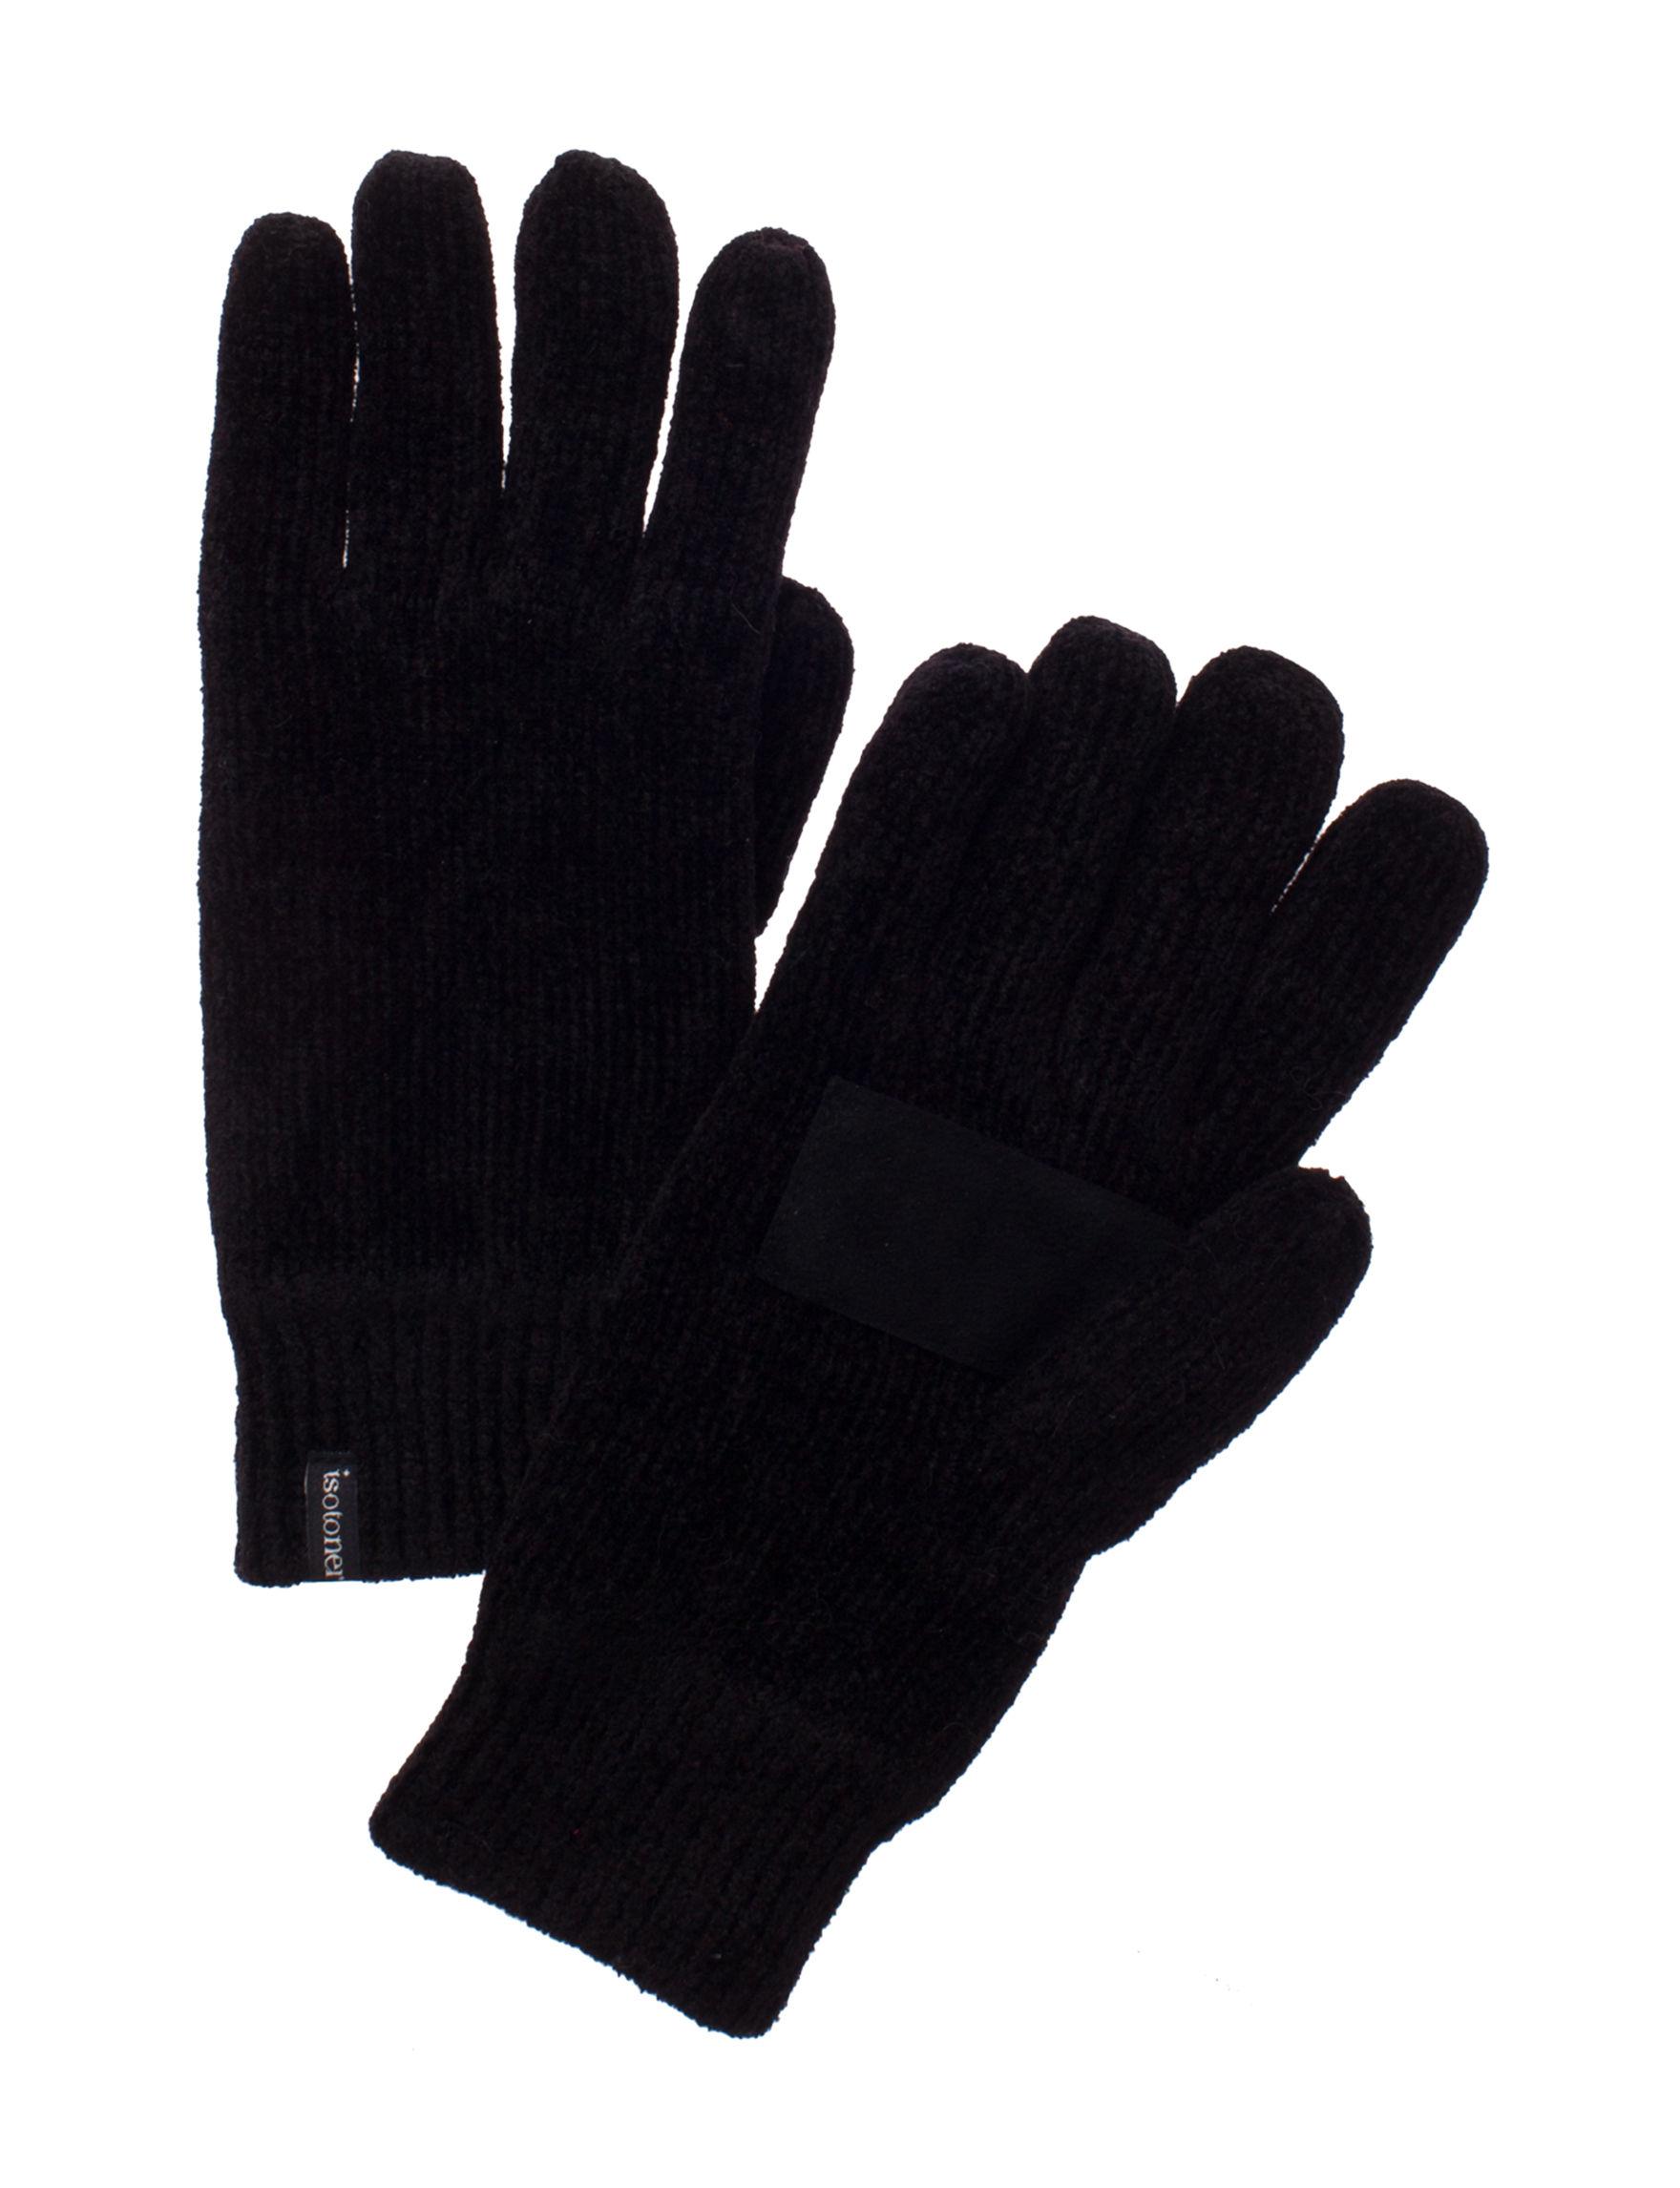 Isotoner Black Gloves & Mittens